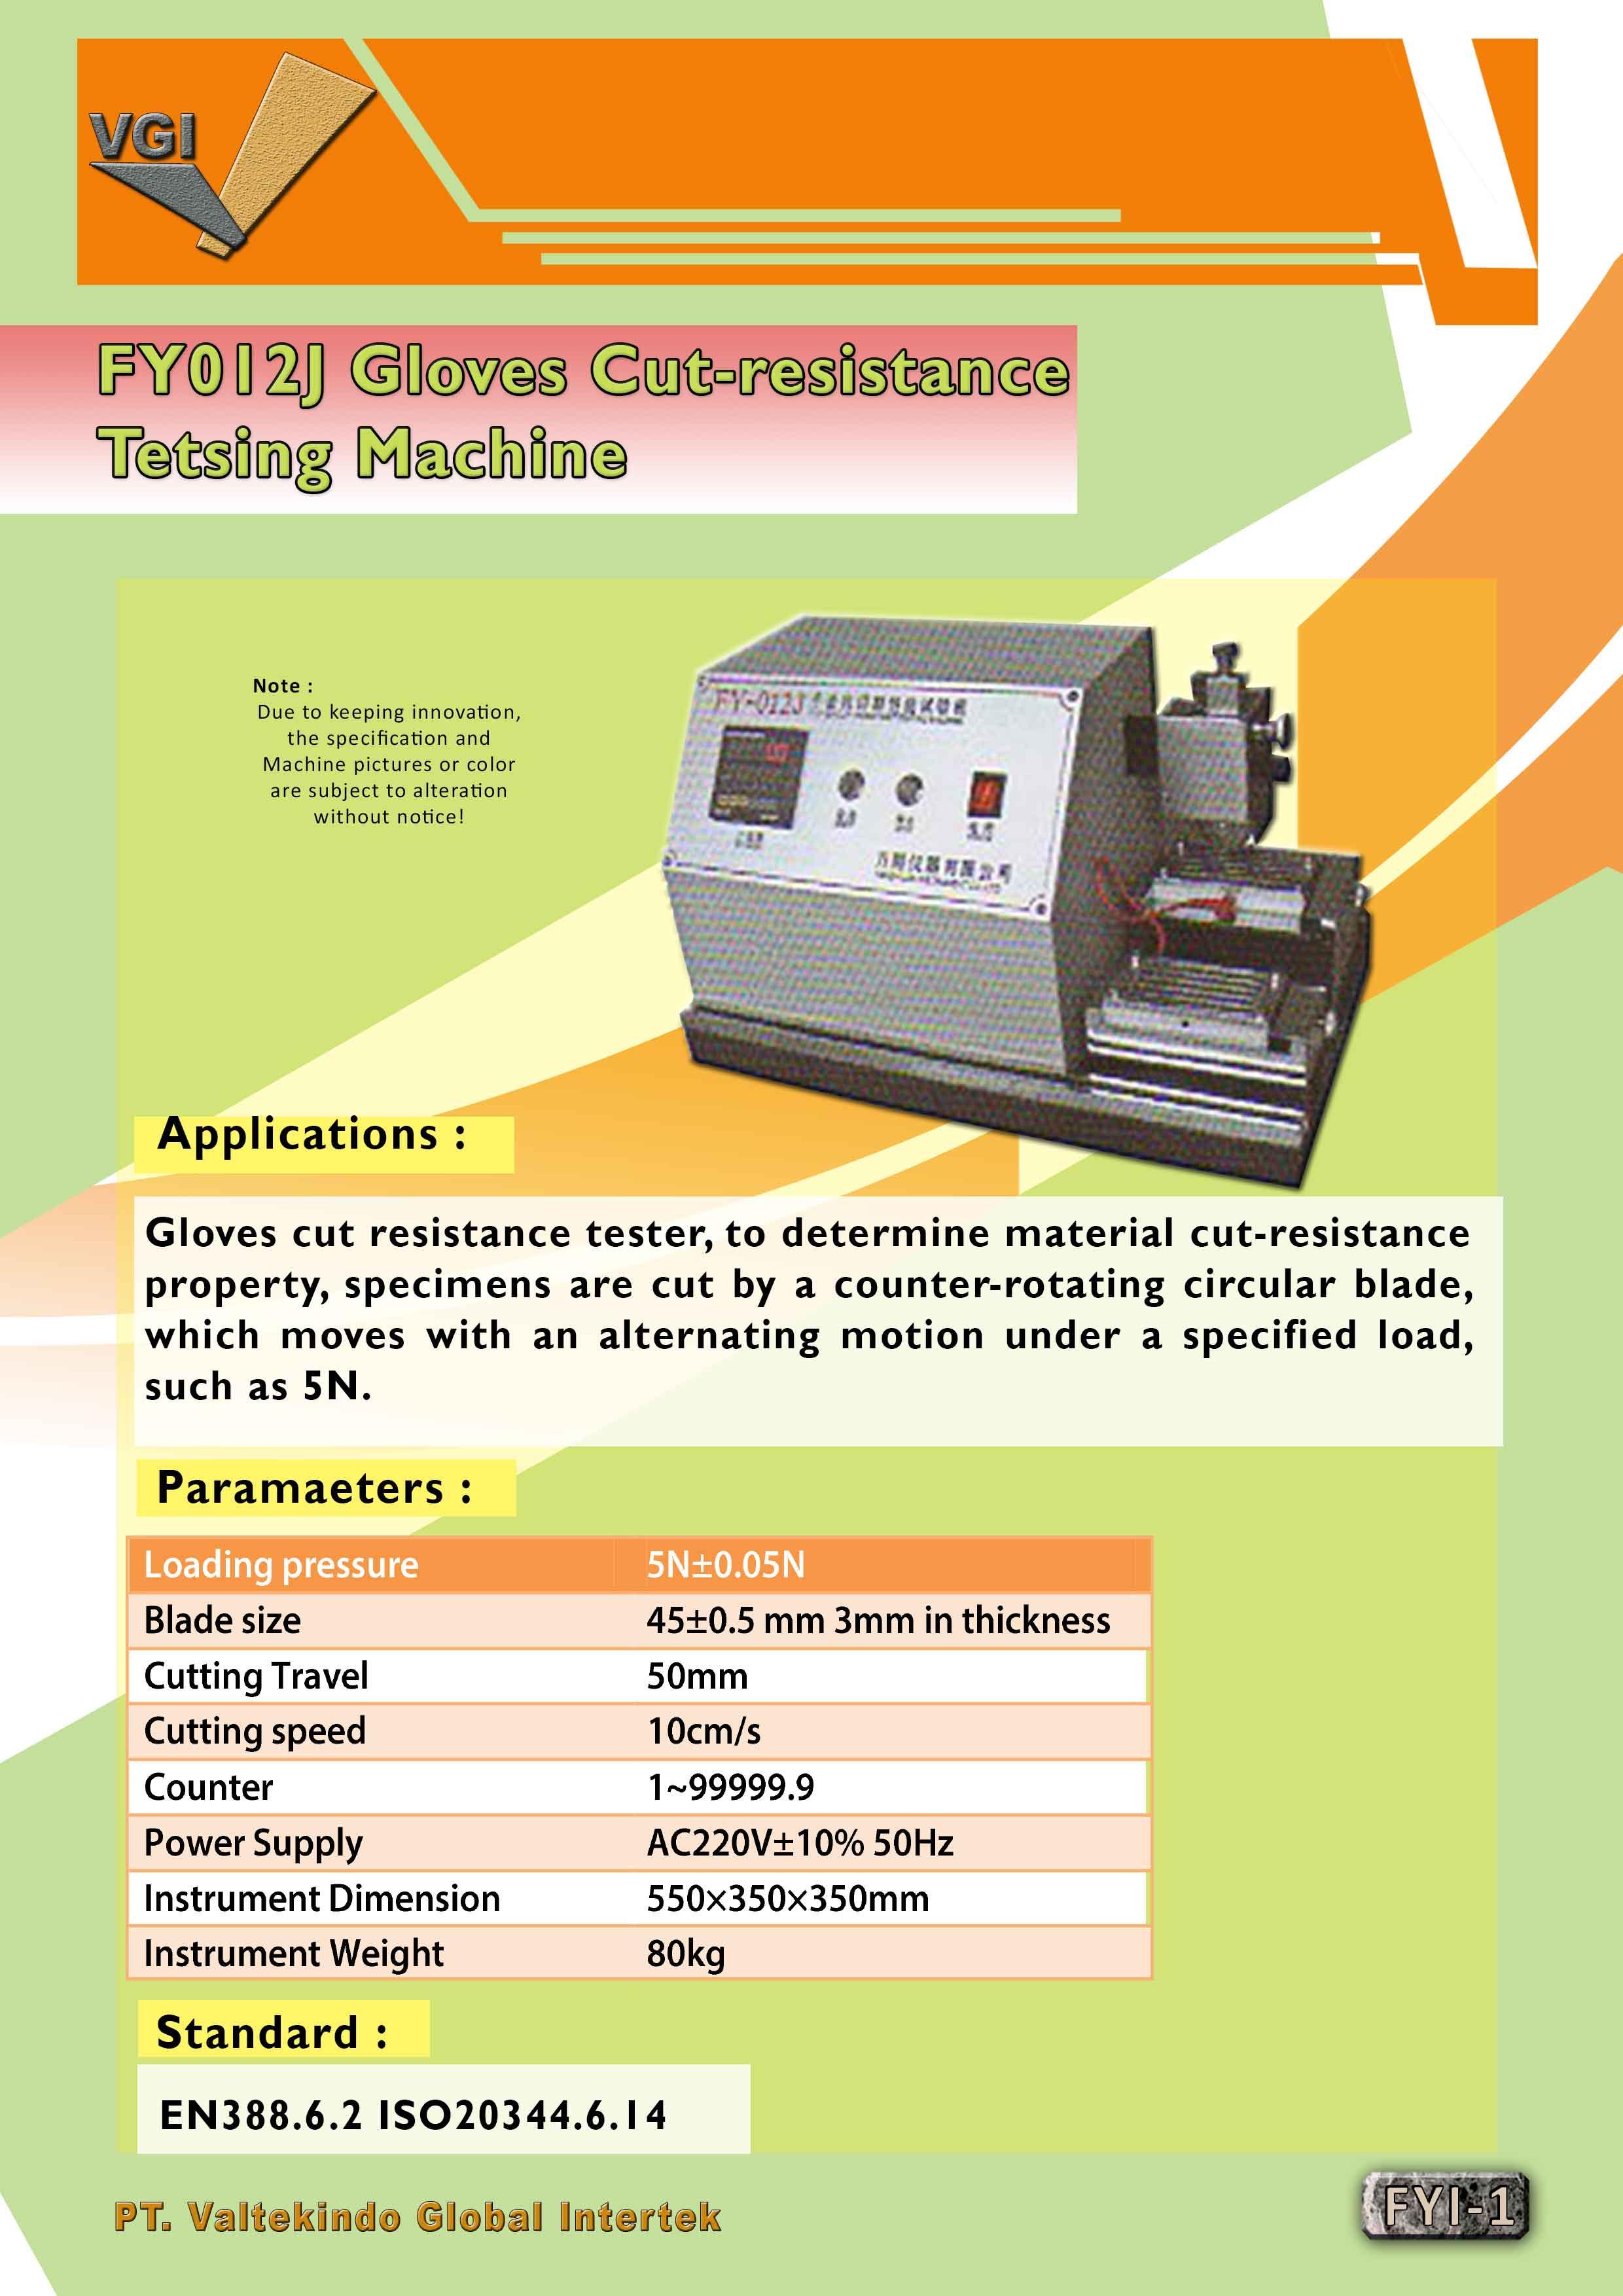 jual mesin Gloves Cut-resistance Testing Machine  Gloves Cut-resistance Testing Machine